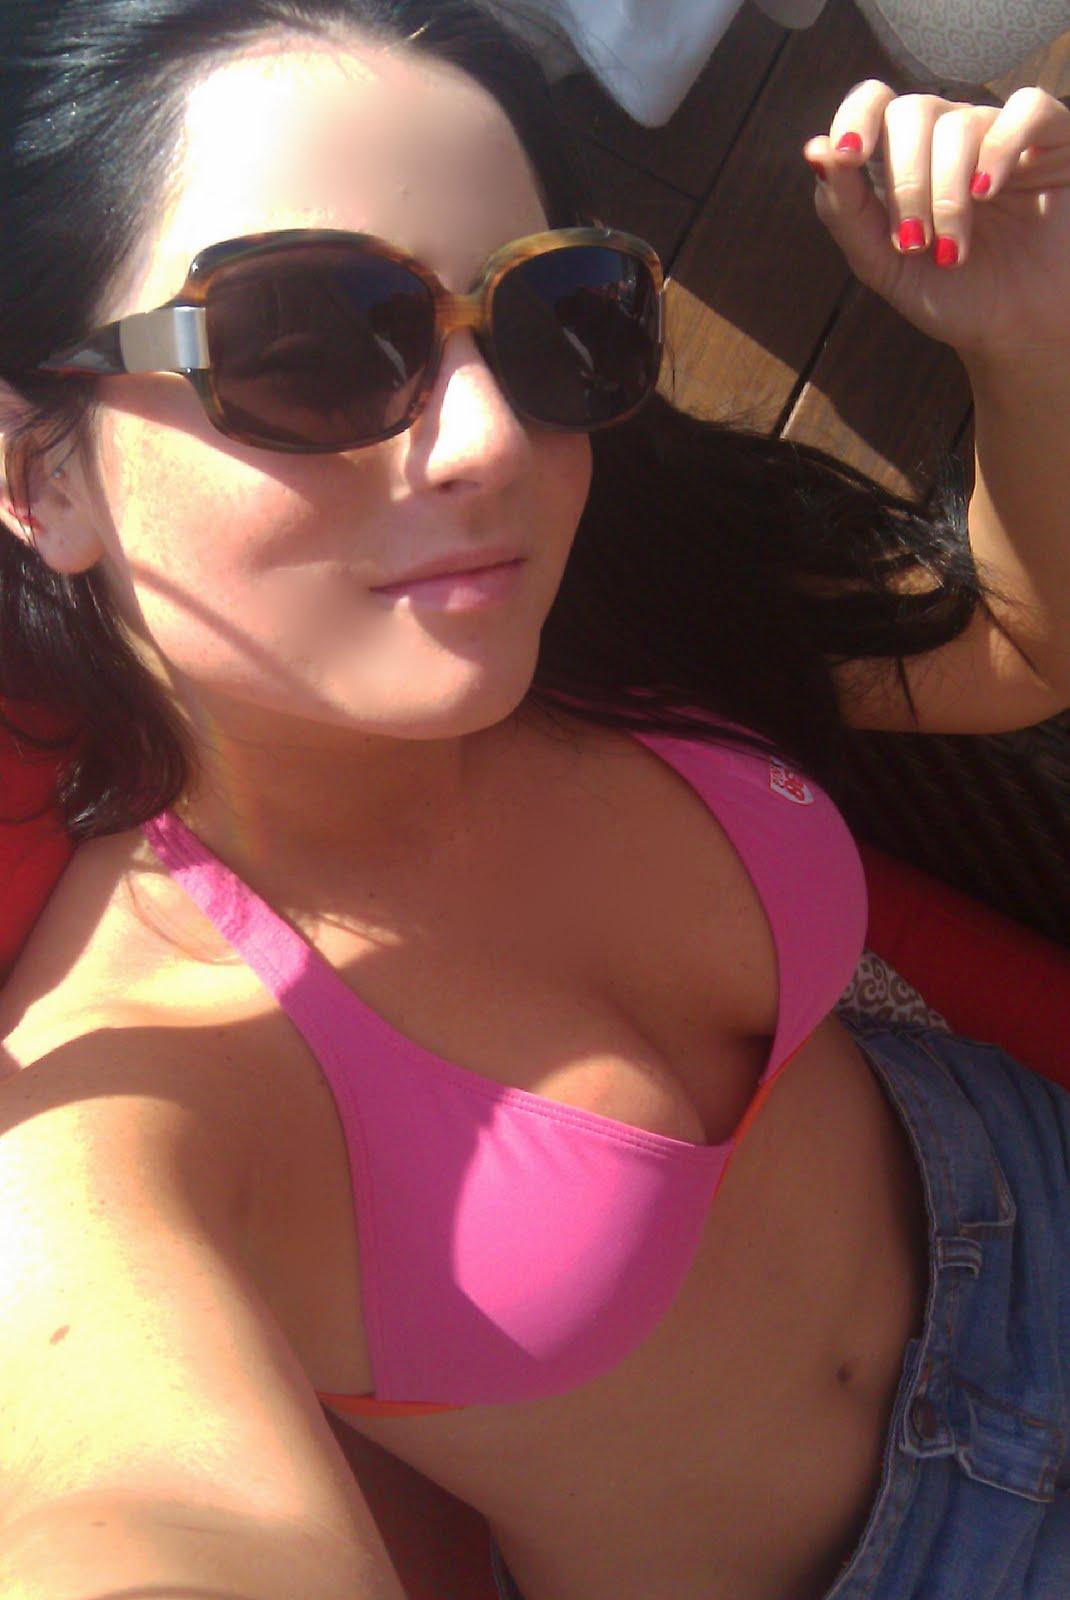 ca4c7bd5fb86f Joanna JoJo Levesque Hot BikiniJojo 2013 Bikini